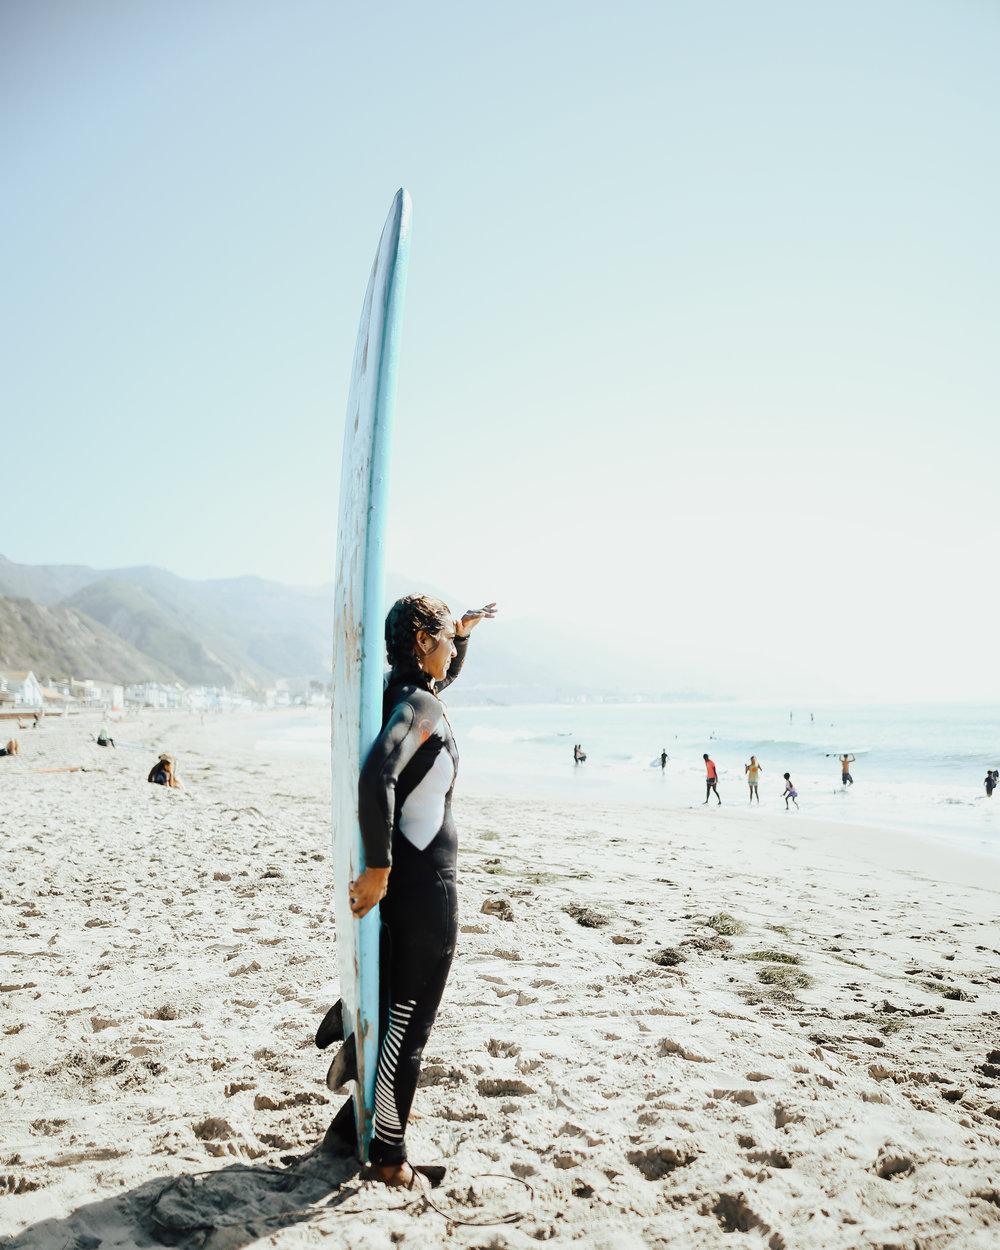 Camp Yoga Surf View.jpg